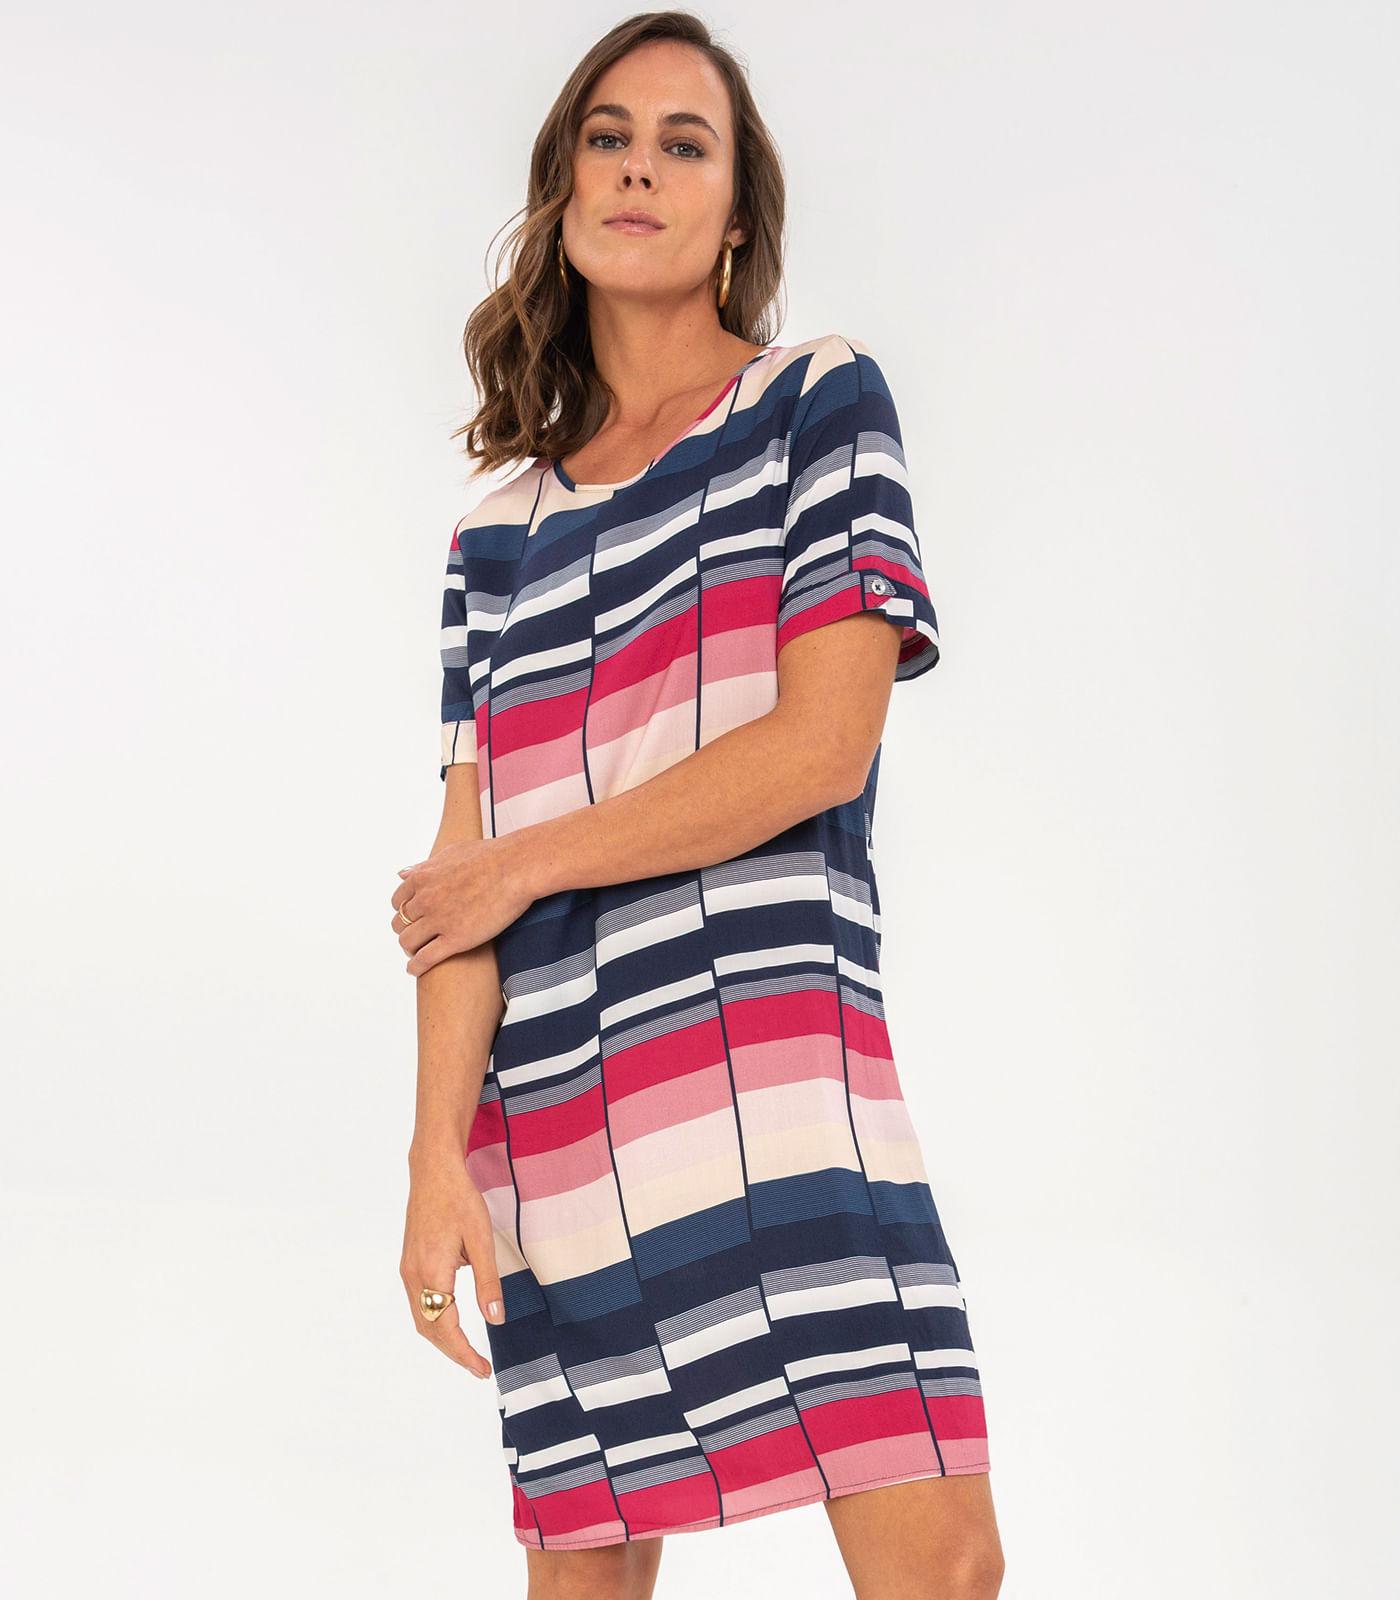 Vestido-Feminino-Geometrico-Rovitex-Vermelho